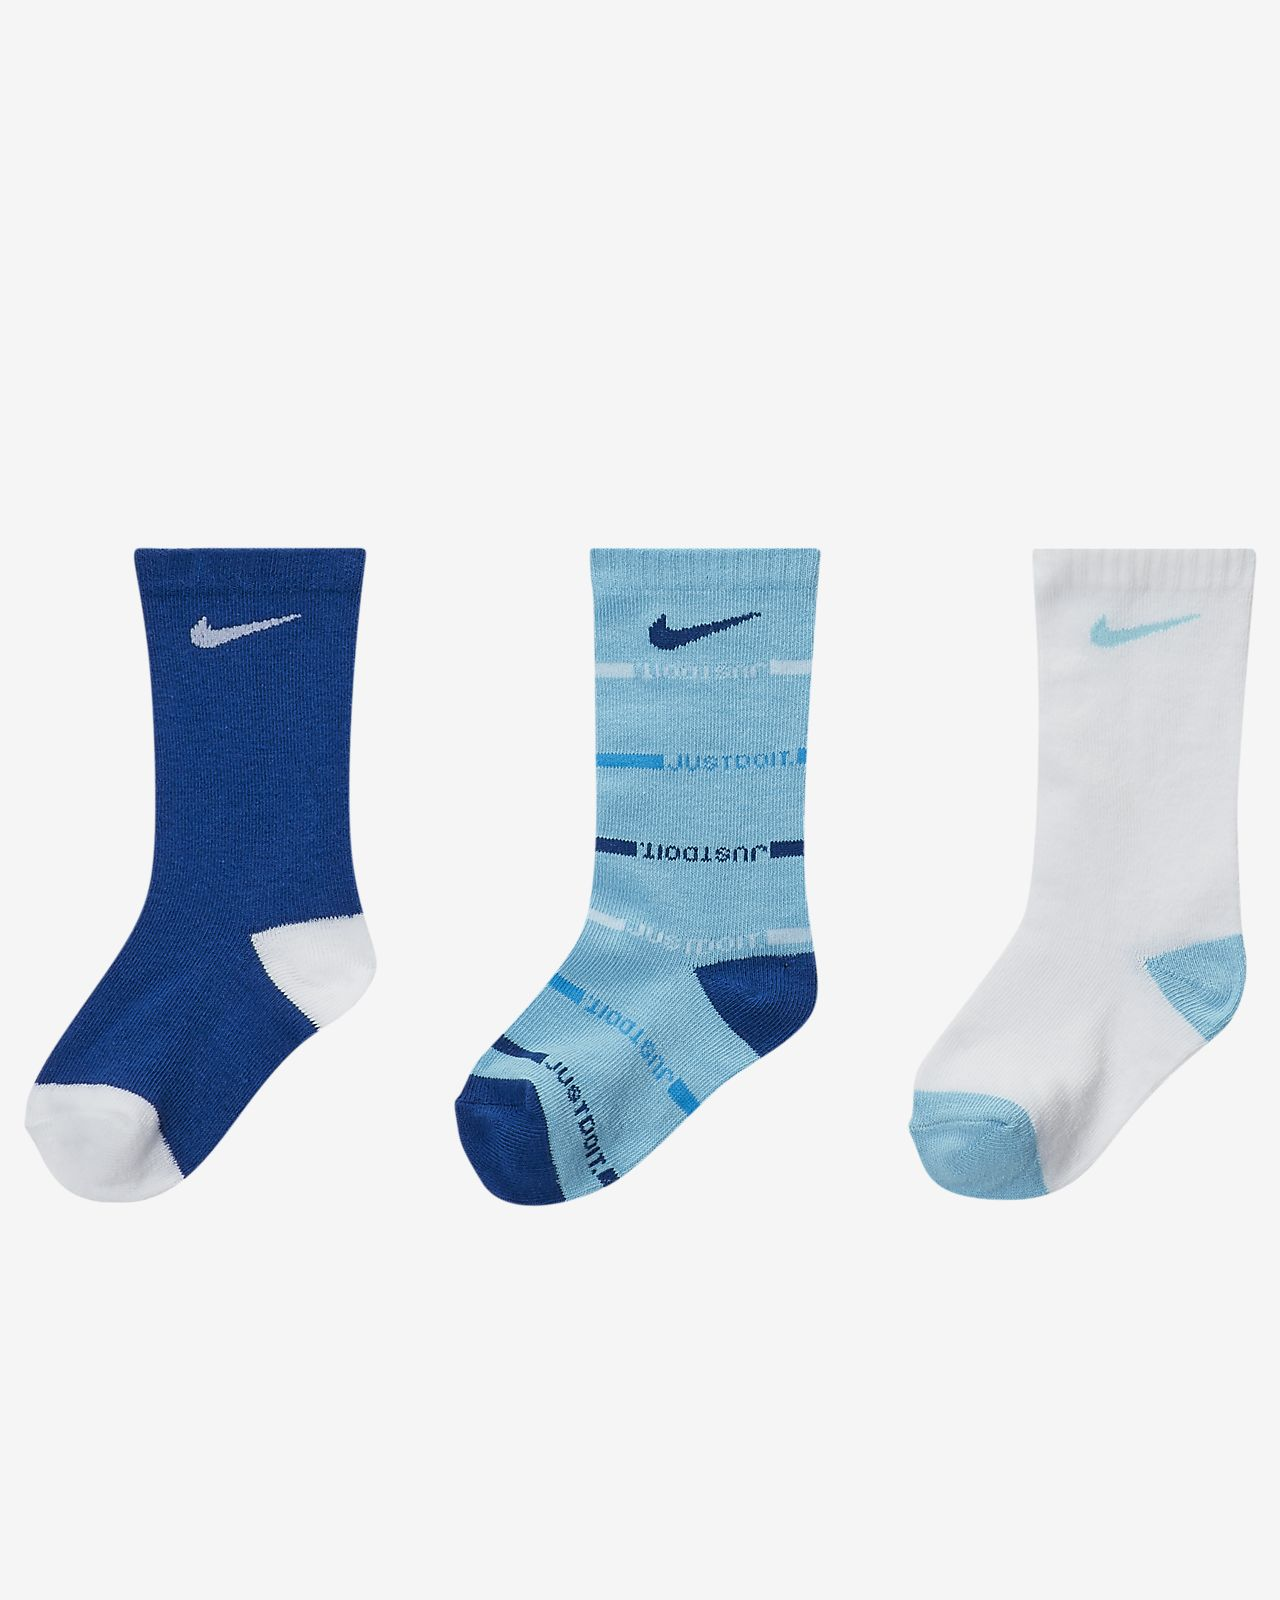 Nike Gripper Toddler Crew Socks (3 Pairs)